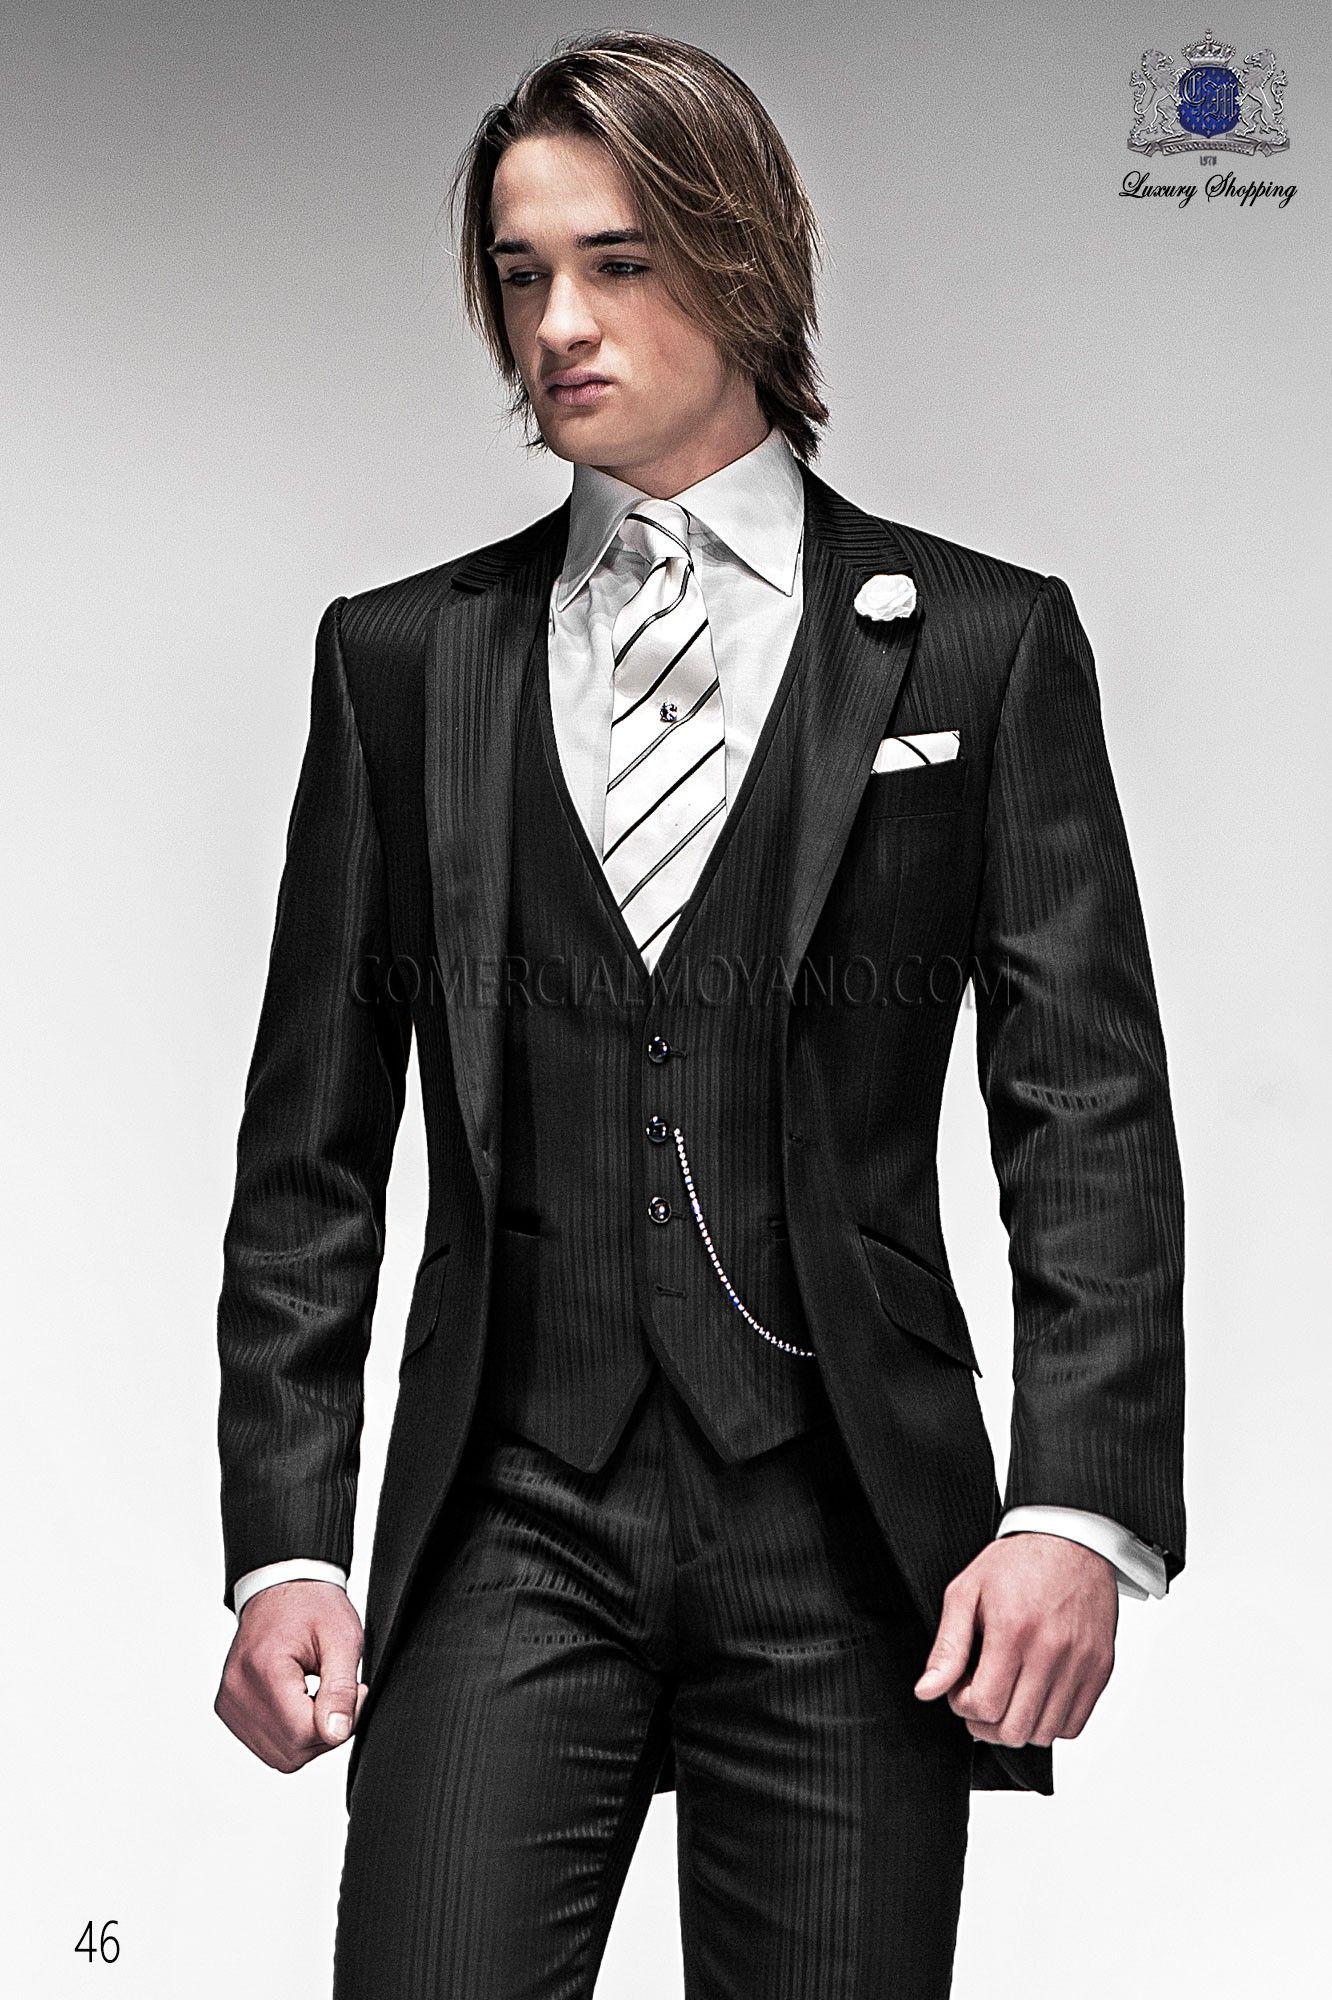 Pin by yahann eyeff romero on suits pinterest